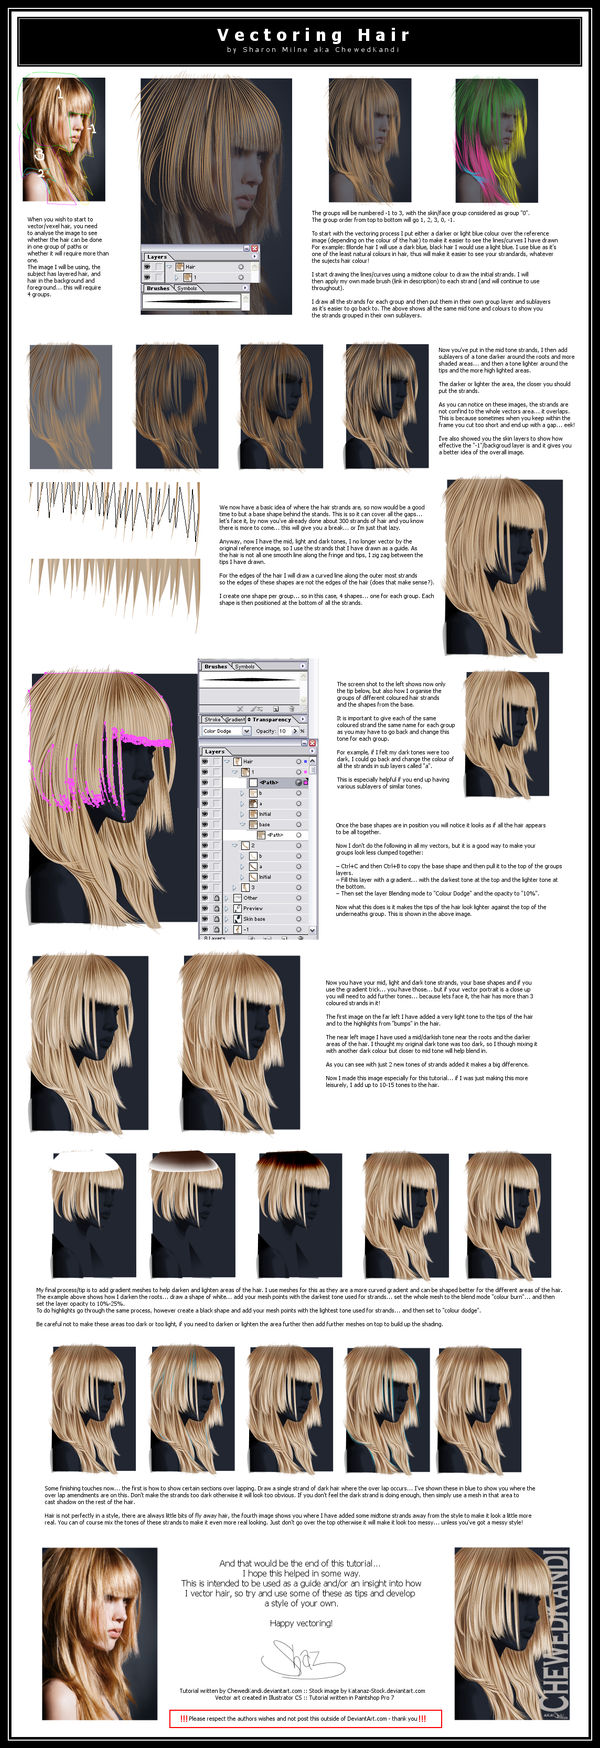 Vectoring Hair